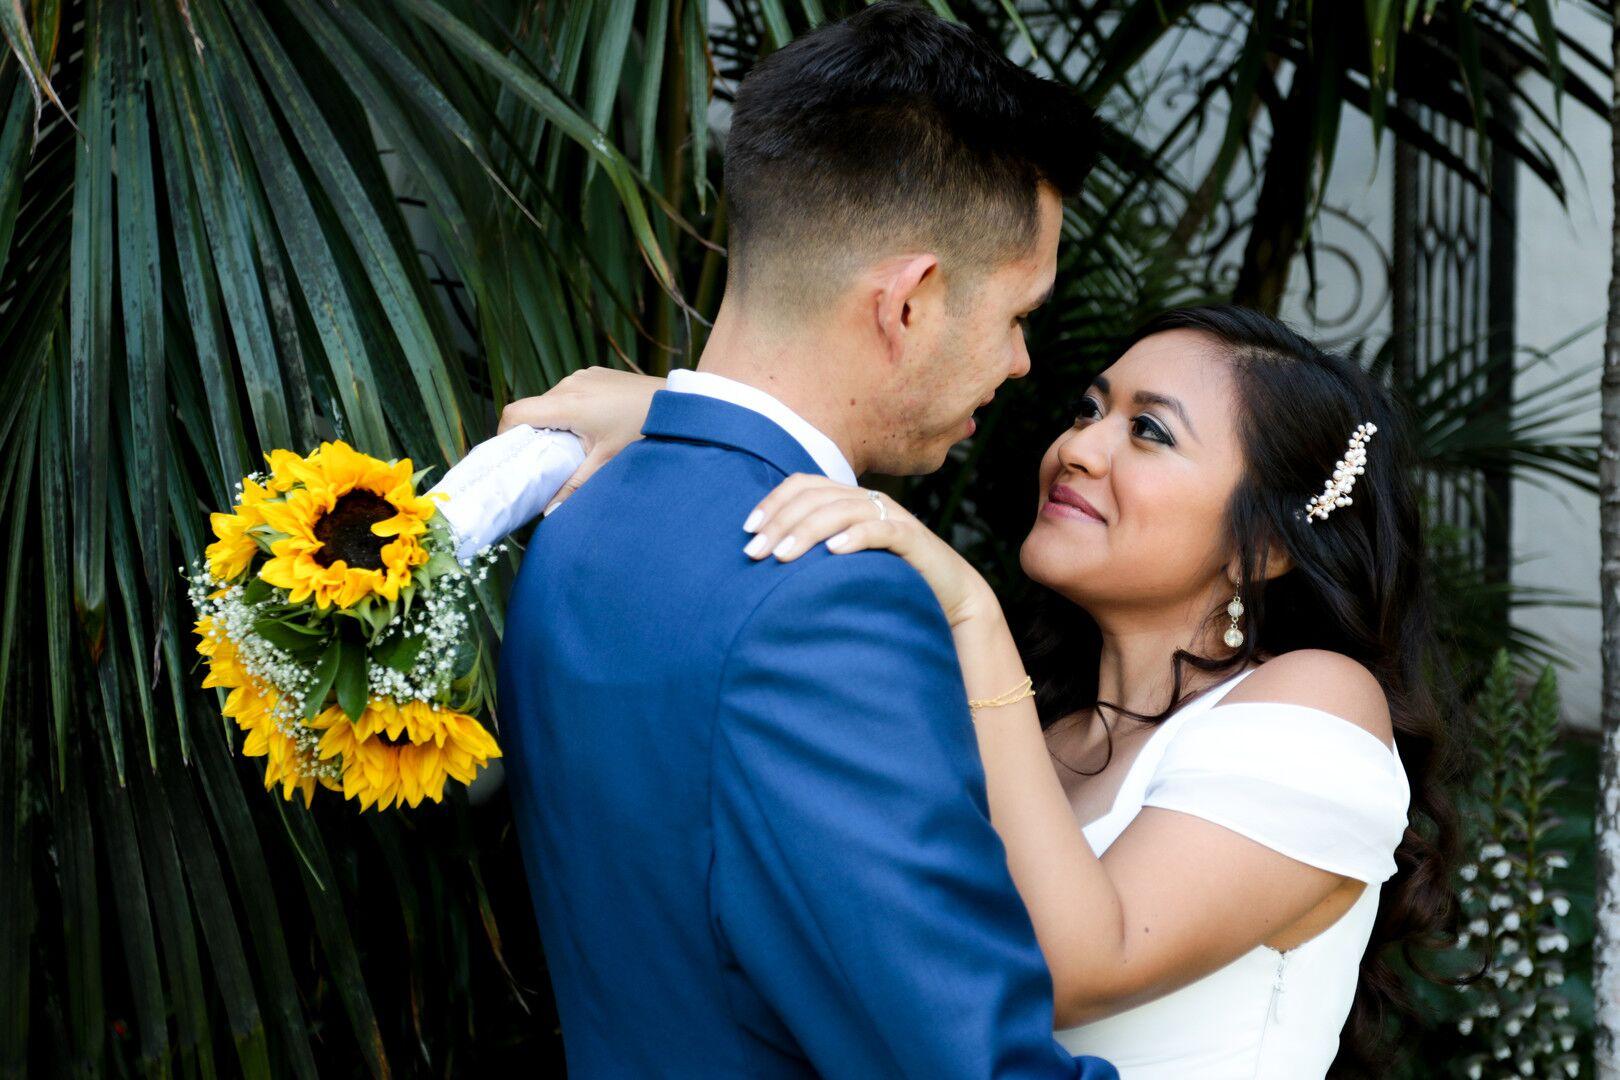 www.santabarbaraweddings.com | Photographer: Trista Maja Photography | Venue: Santa Barbara Courthouse | Wedding Dress: Lulus | Hair: Legends Hair | Bride and Groom Loving Gaze